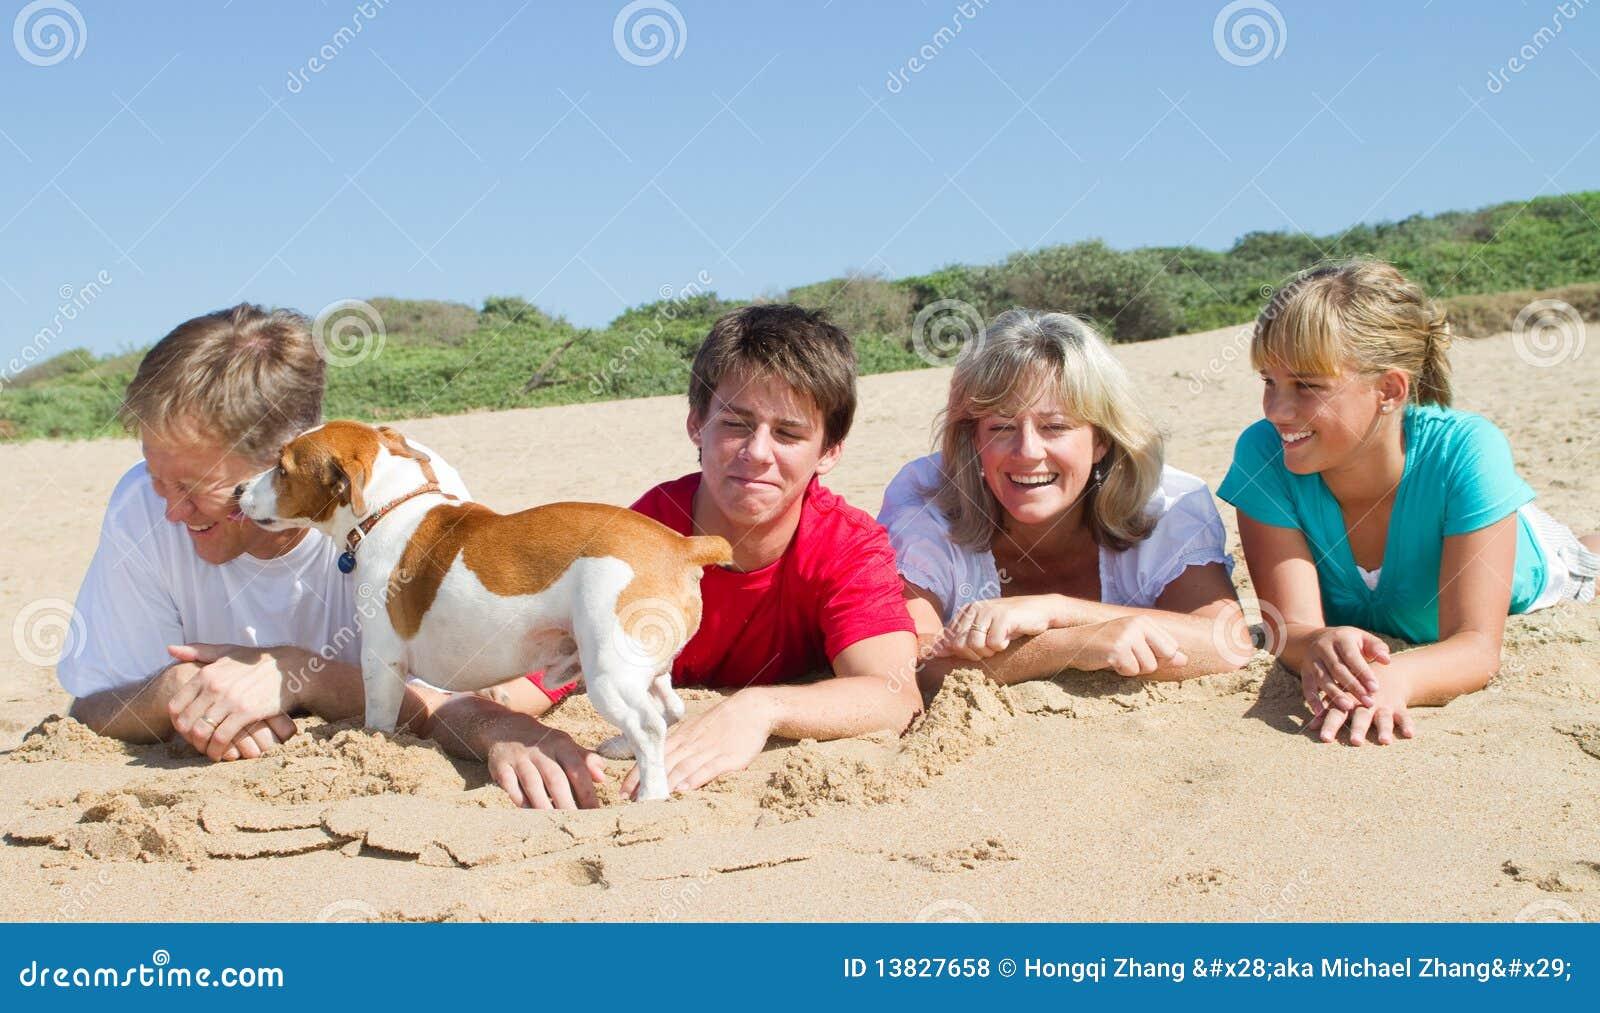 Family lying on beach